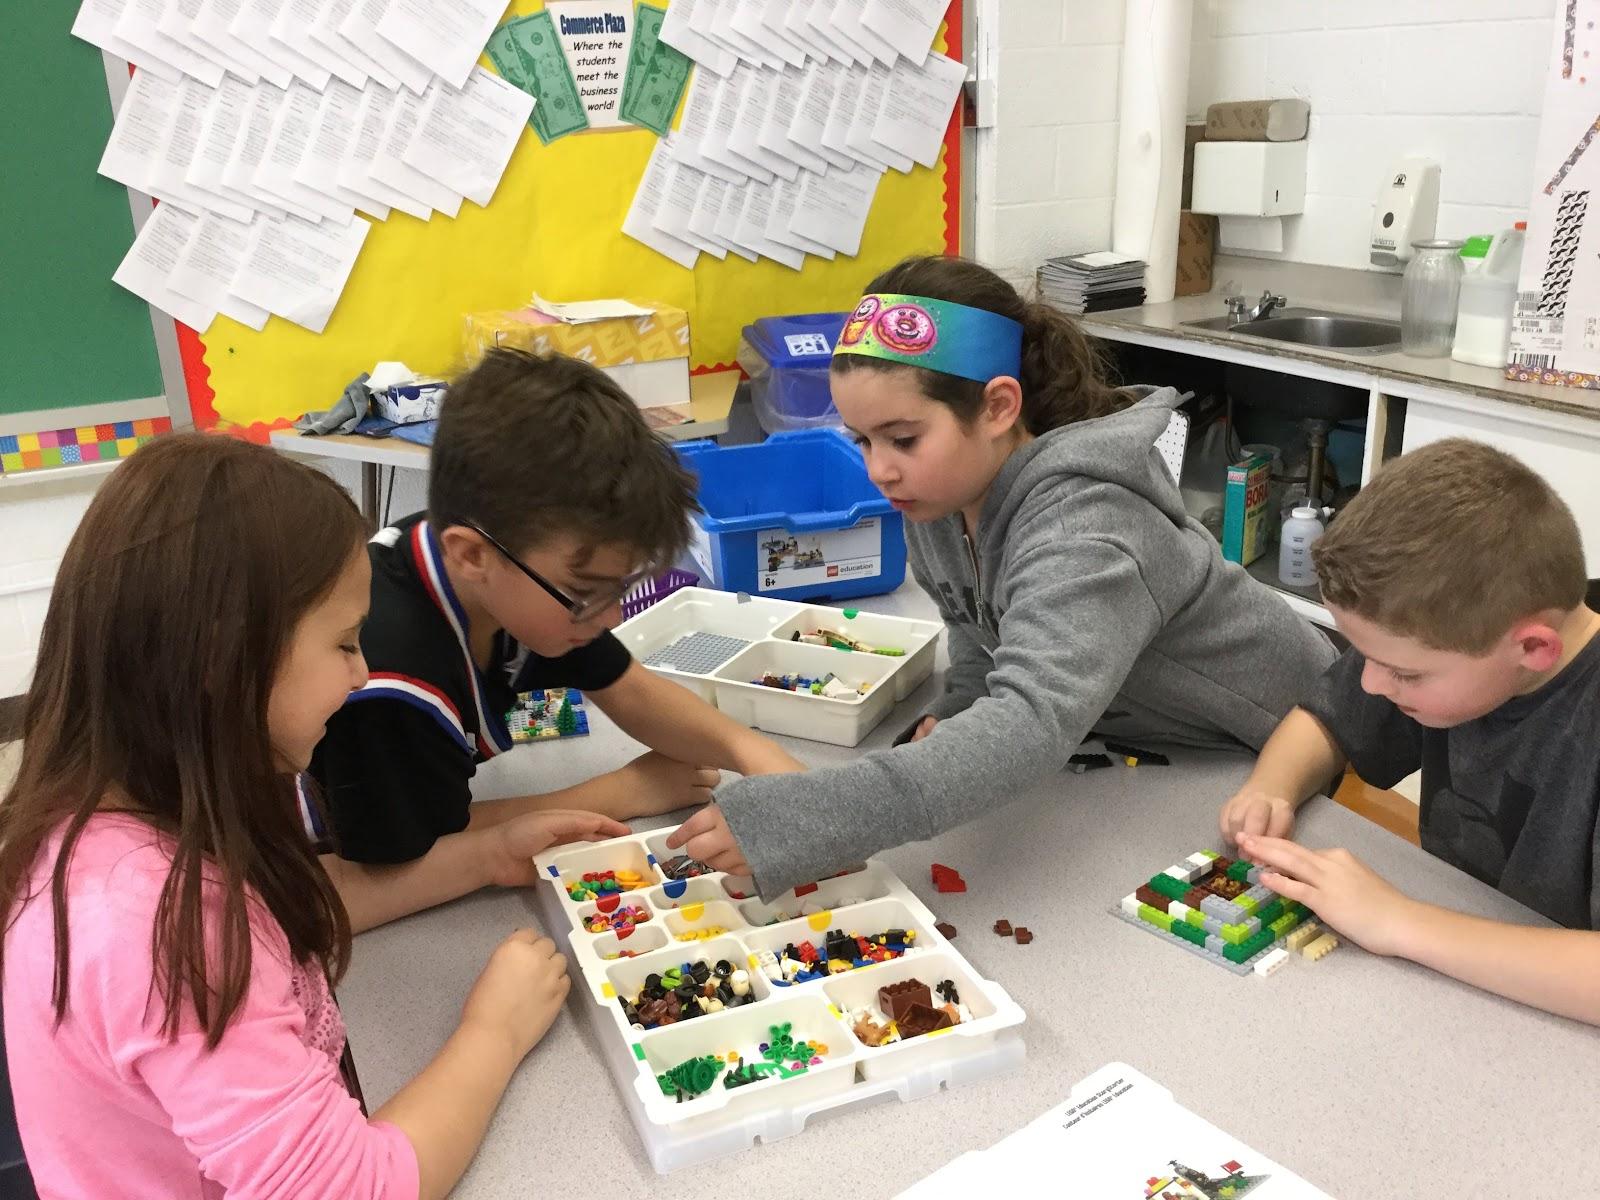 math worksheet : third grade math enrichment activities  the best and most  : Enrichment Math Worksheets